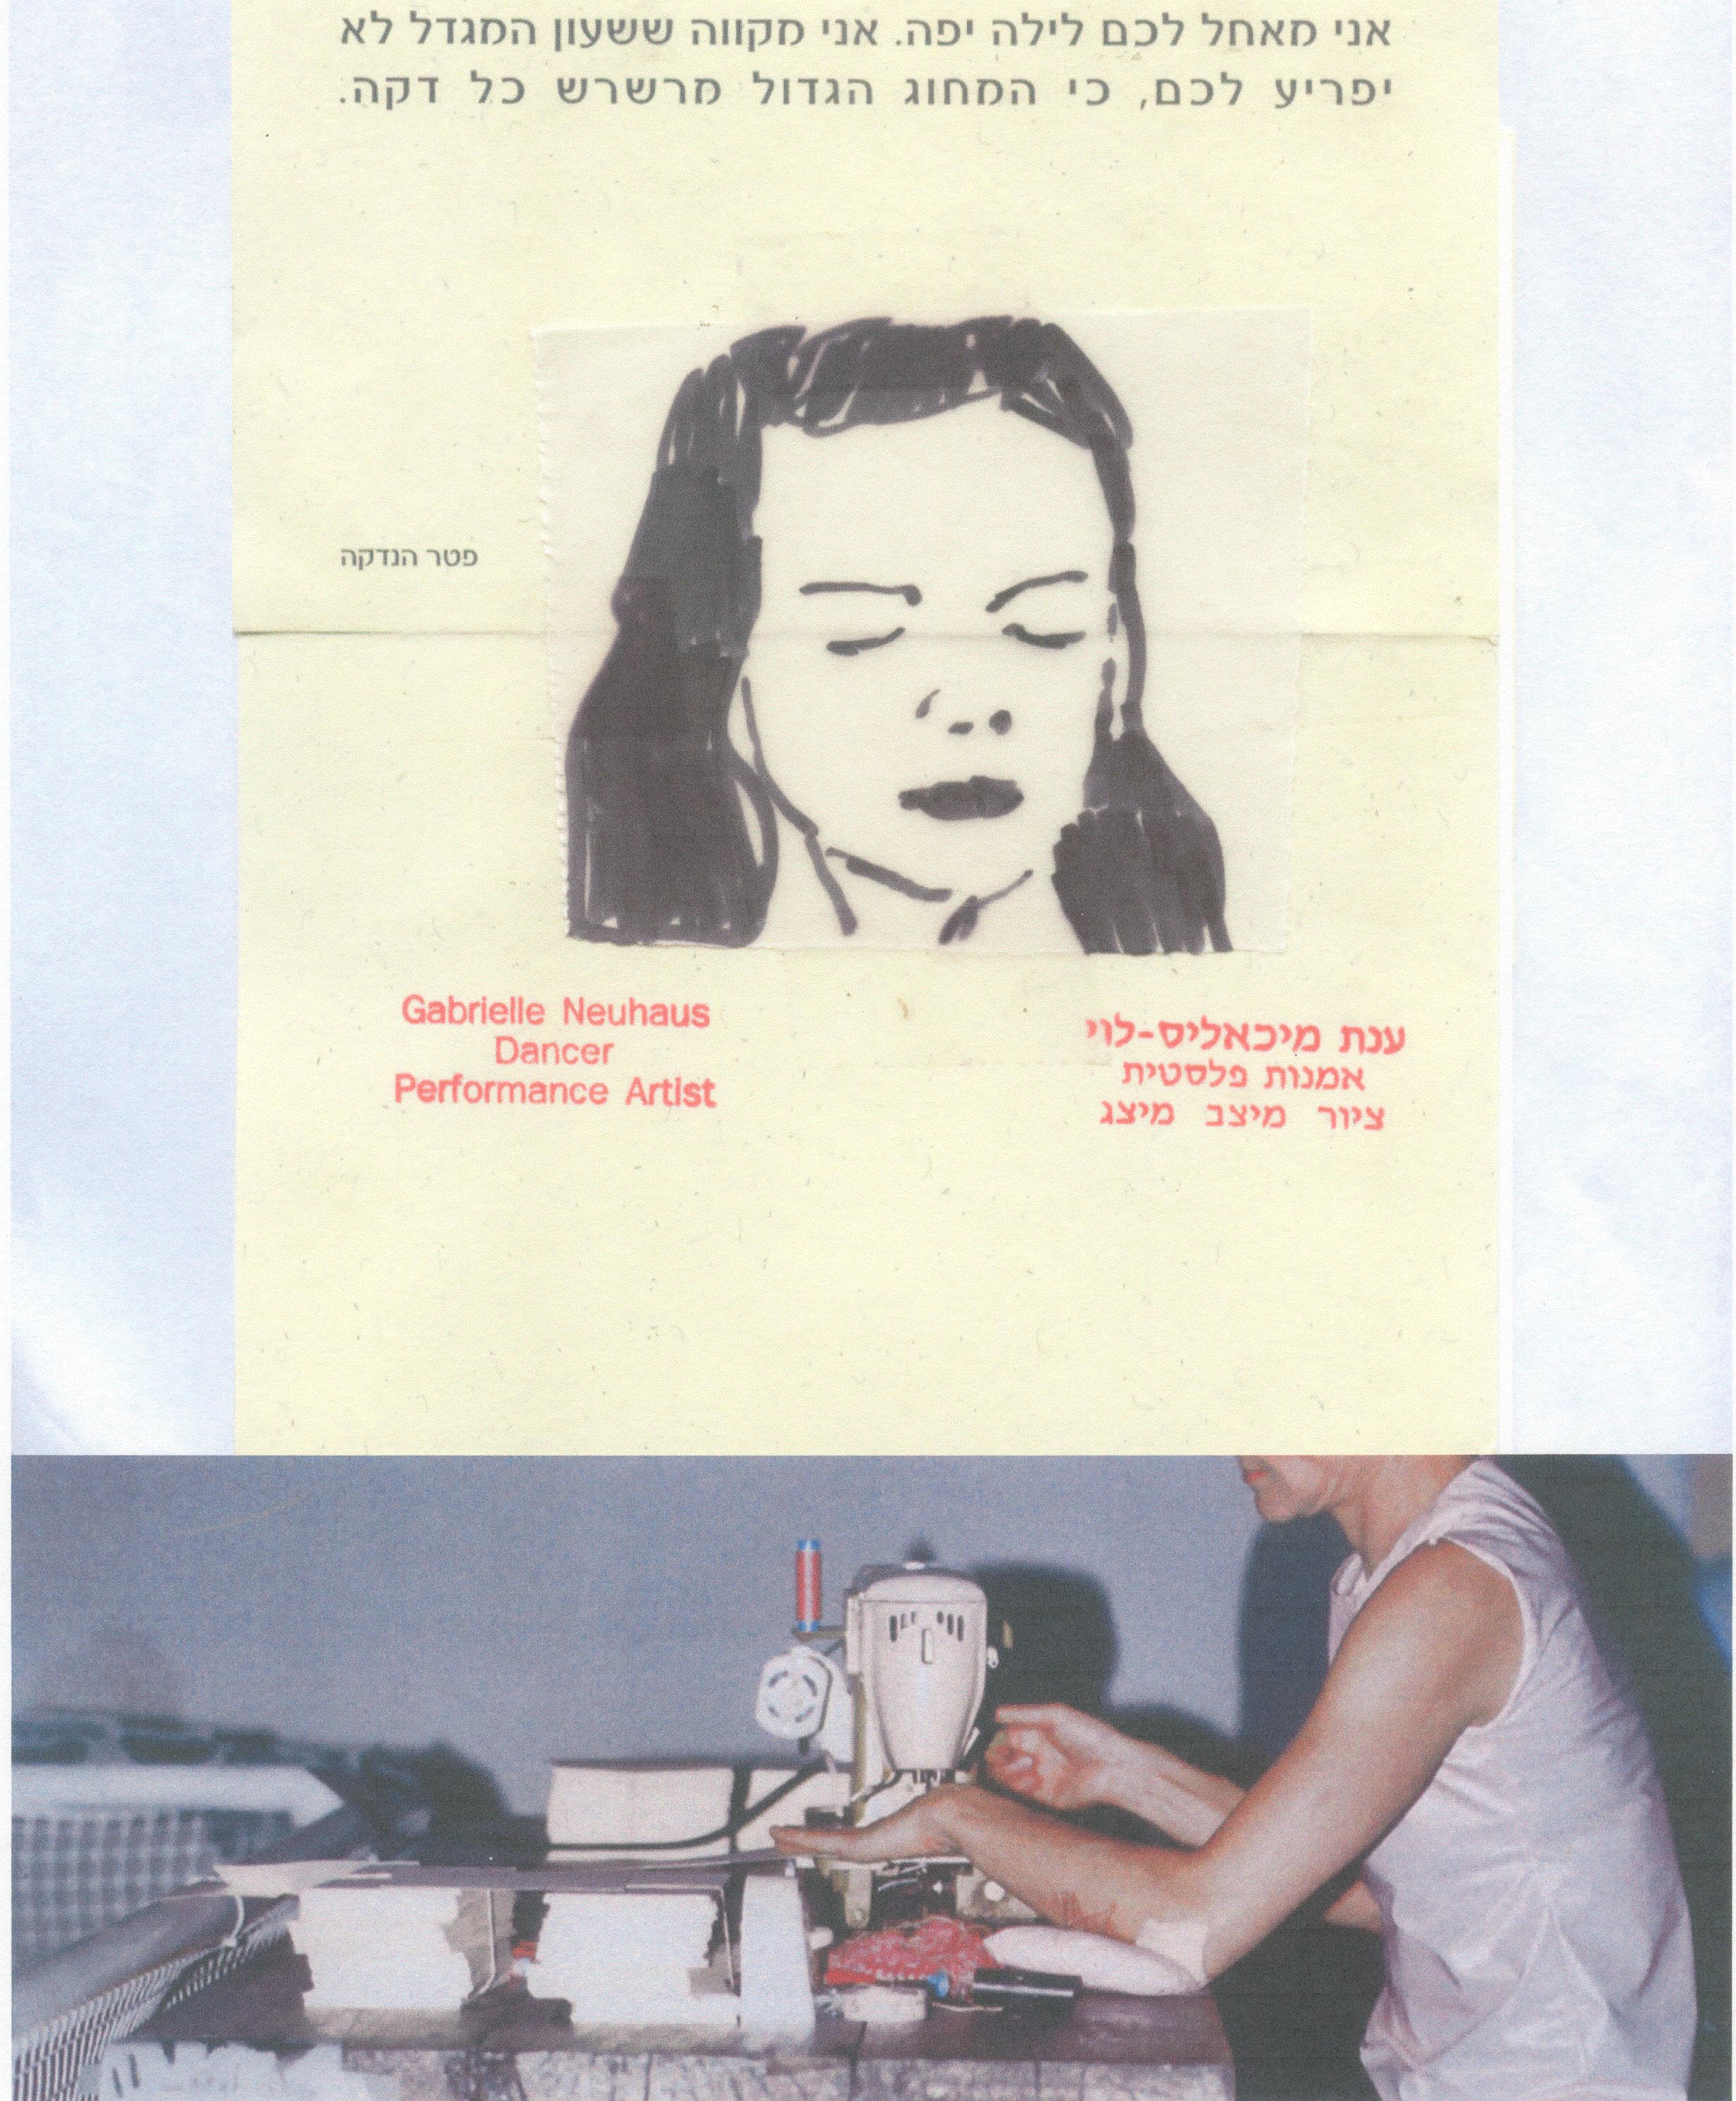 Photo & drawing: Anat Michaelis-Levy